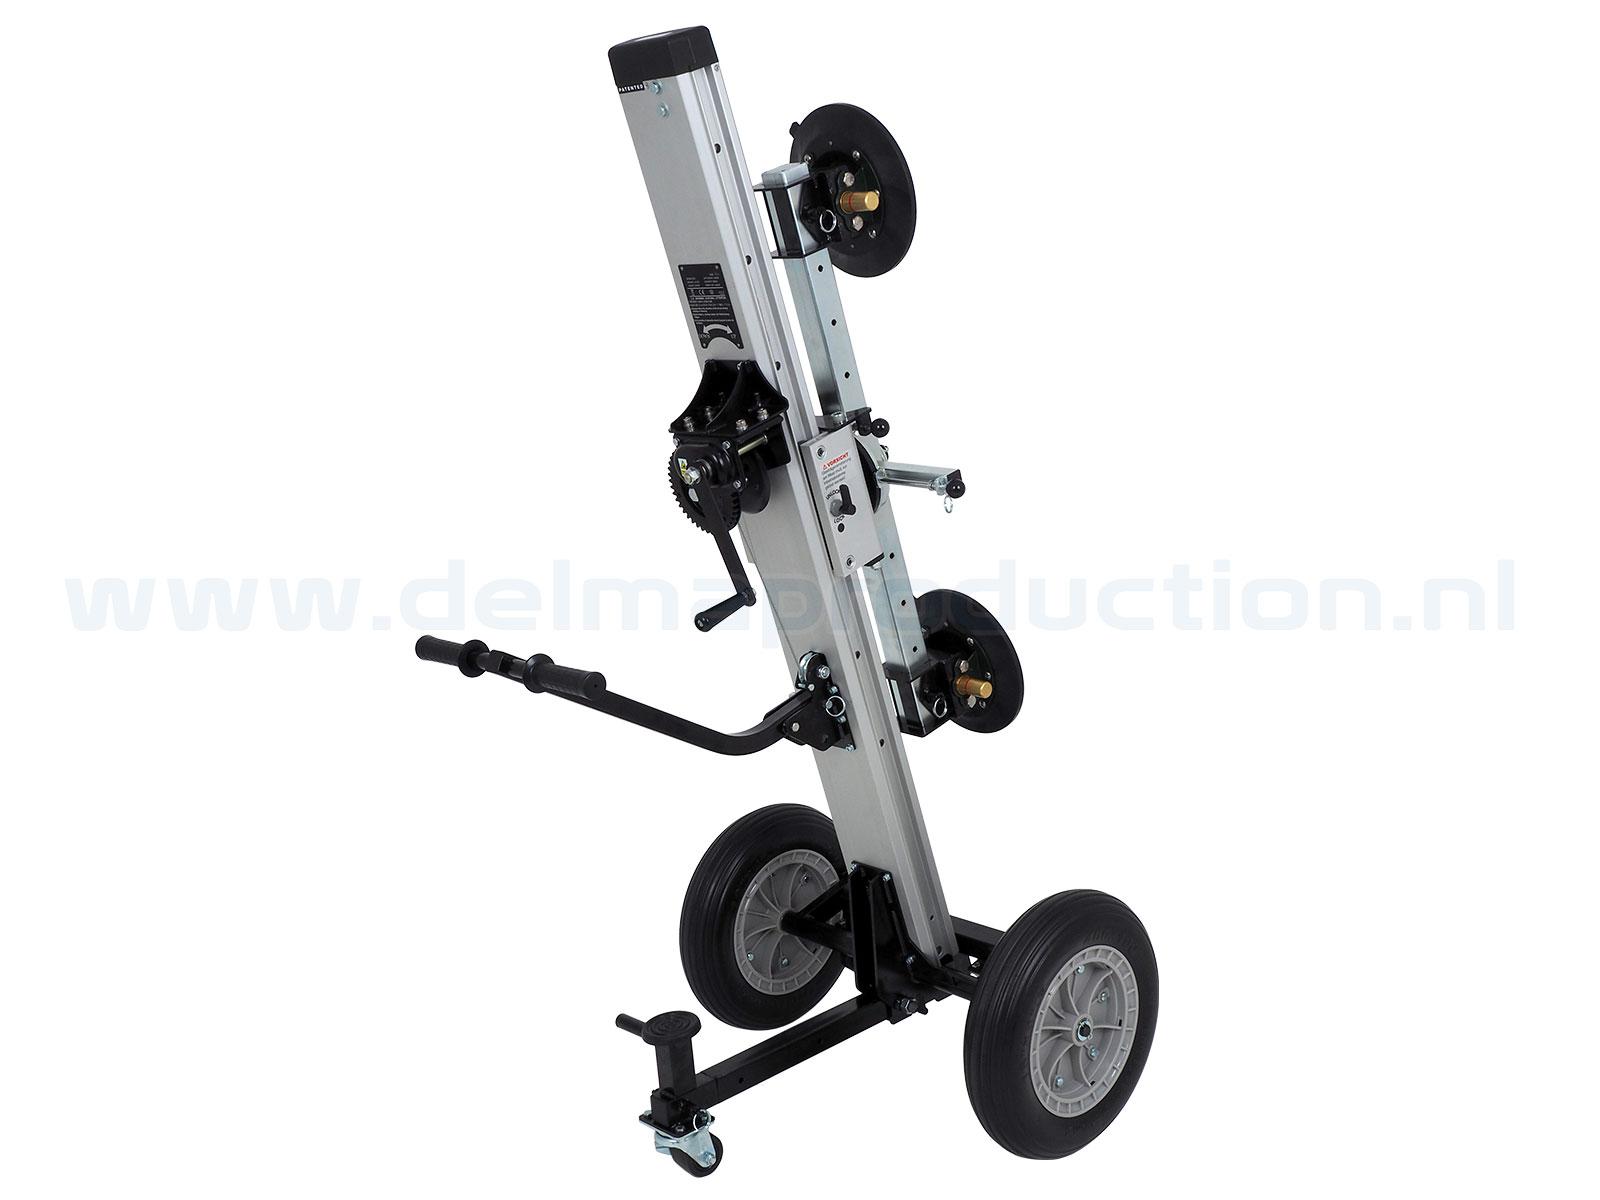 Glas transport- en montagelift Max. hoogte: 1,60 m Gewicht: 49 kg Wielen: 4 stuks (2 geremd) Vloeroppervlak: 1,4 x 1,4 m Draagvermogen: 180 kg (2)